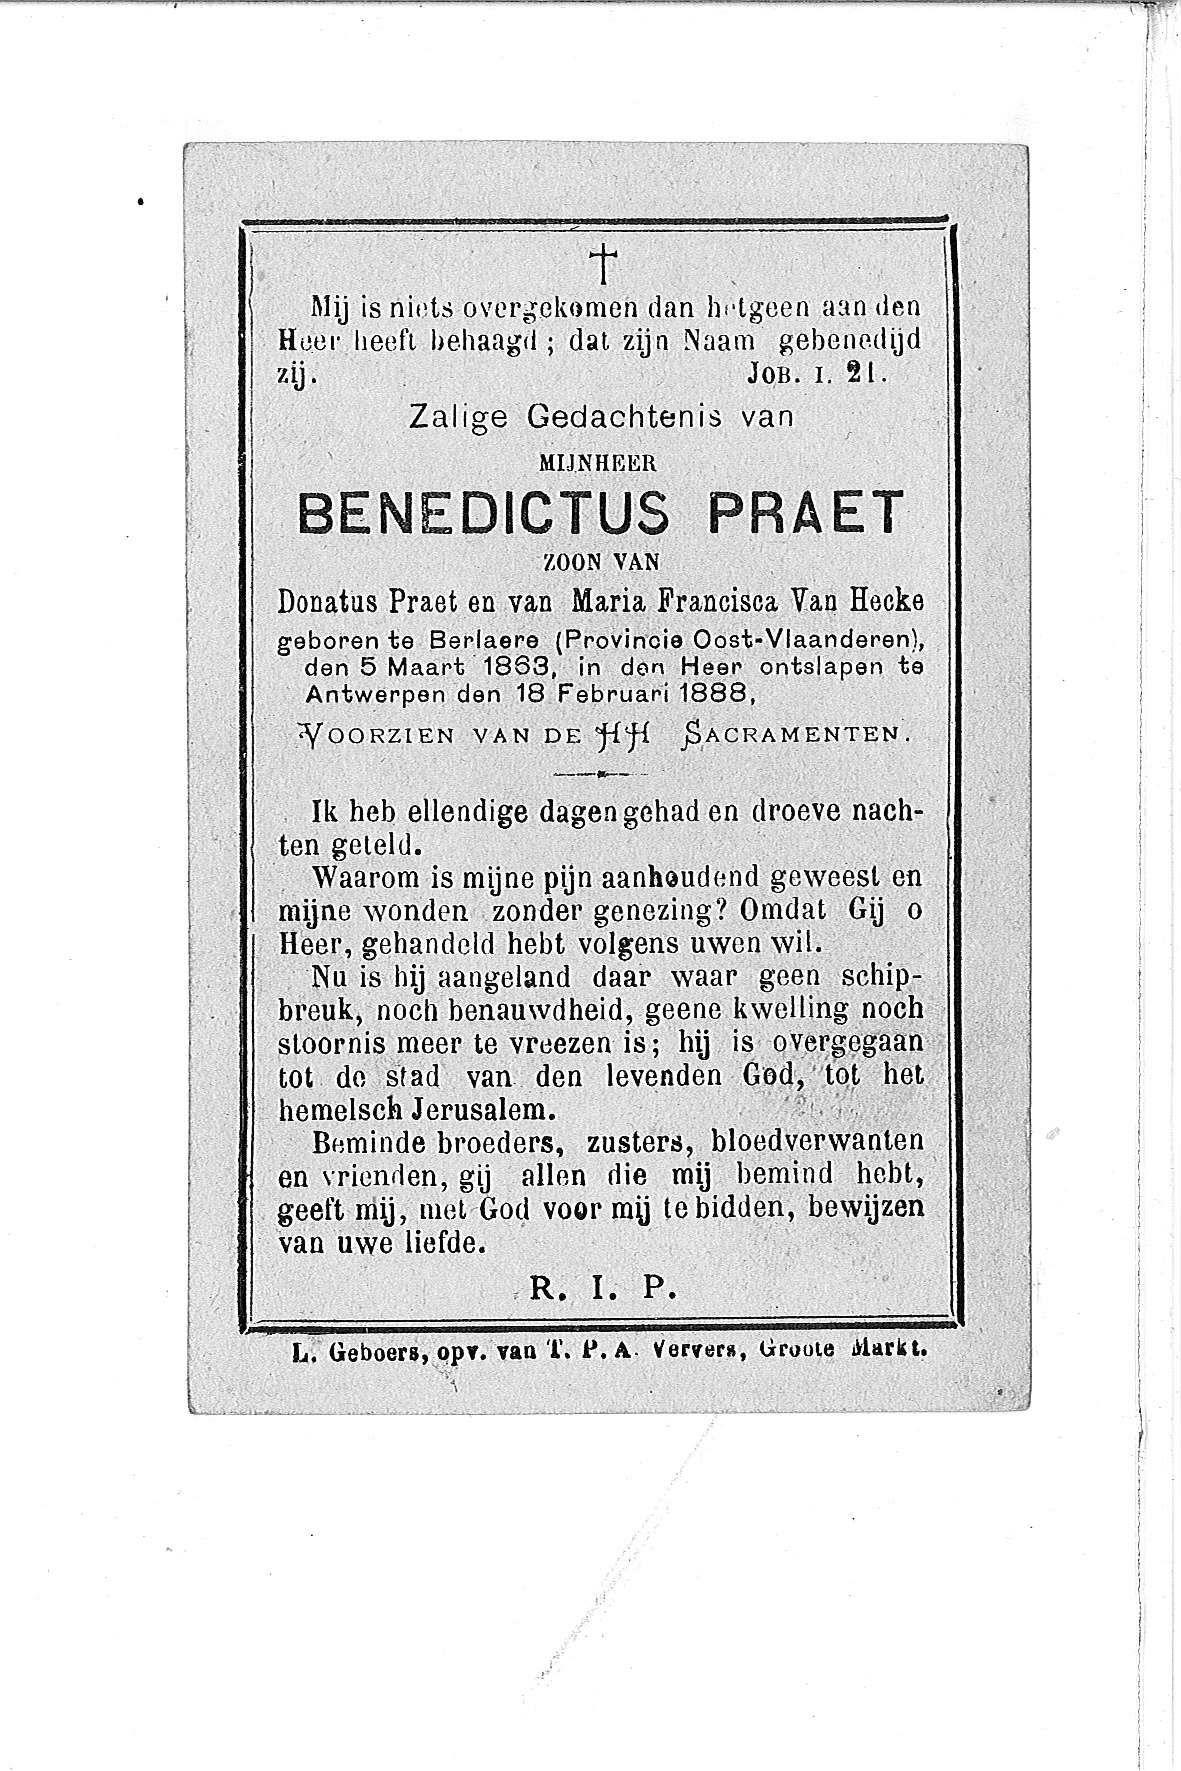 Benedictus(1888)20100507162431_00002.jpg